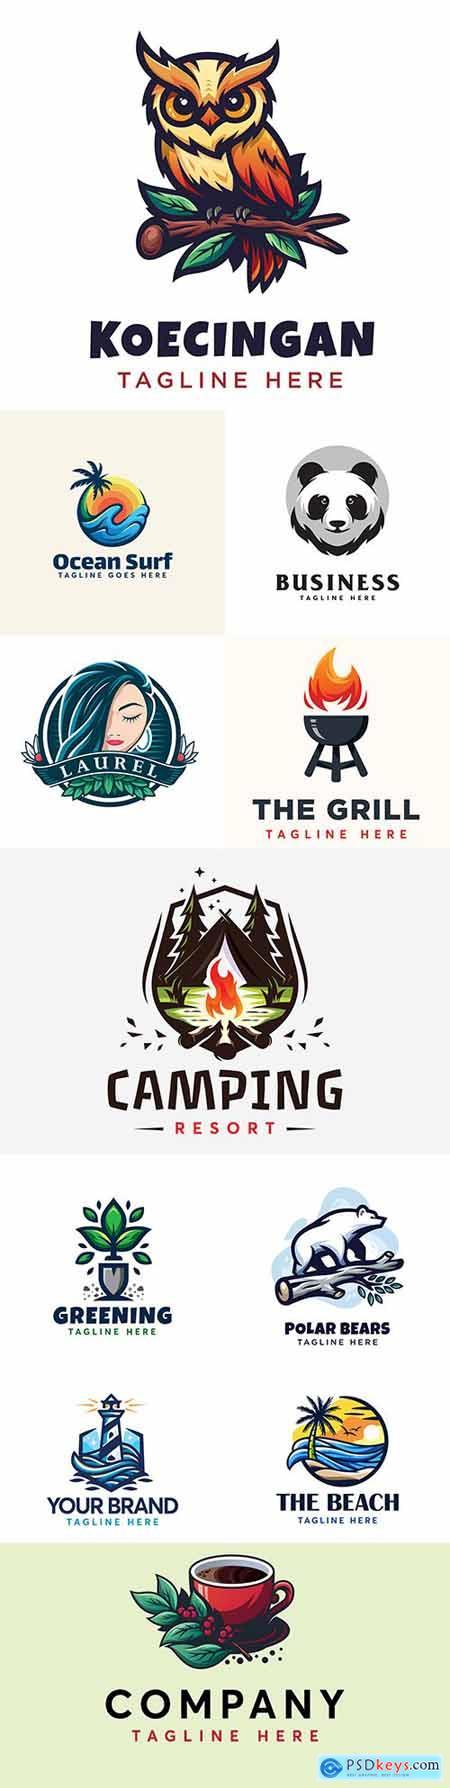 Brand name company logos business corporate design 20